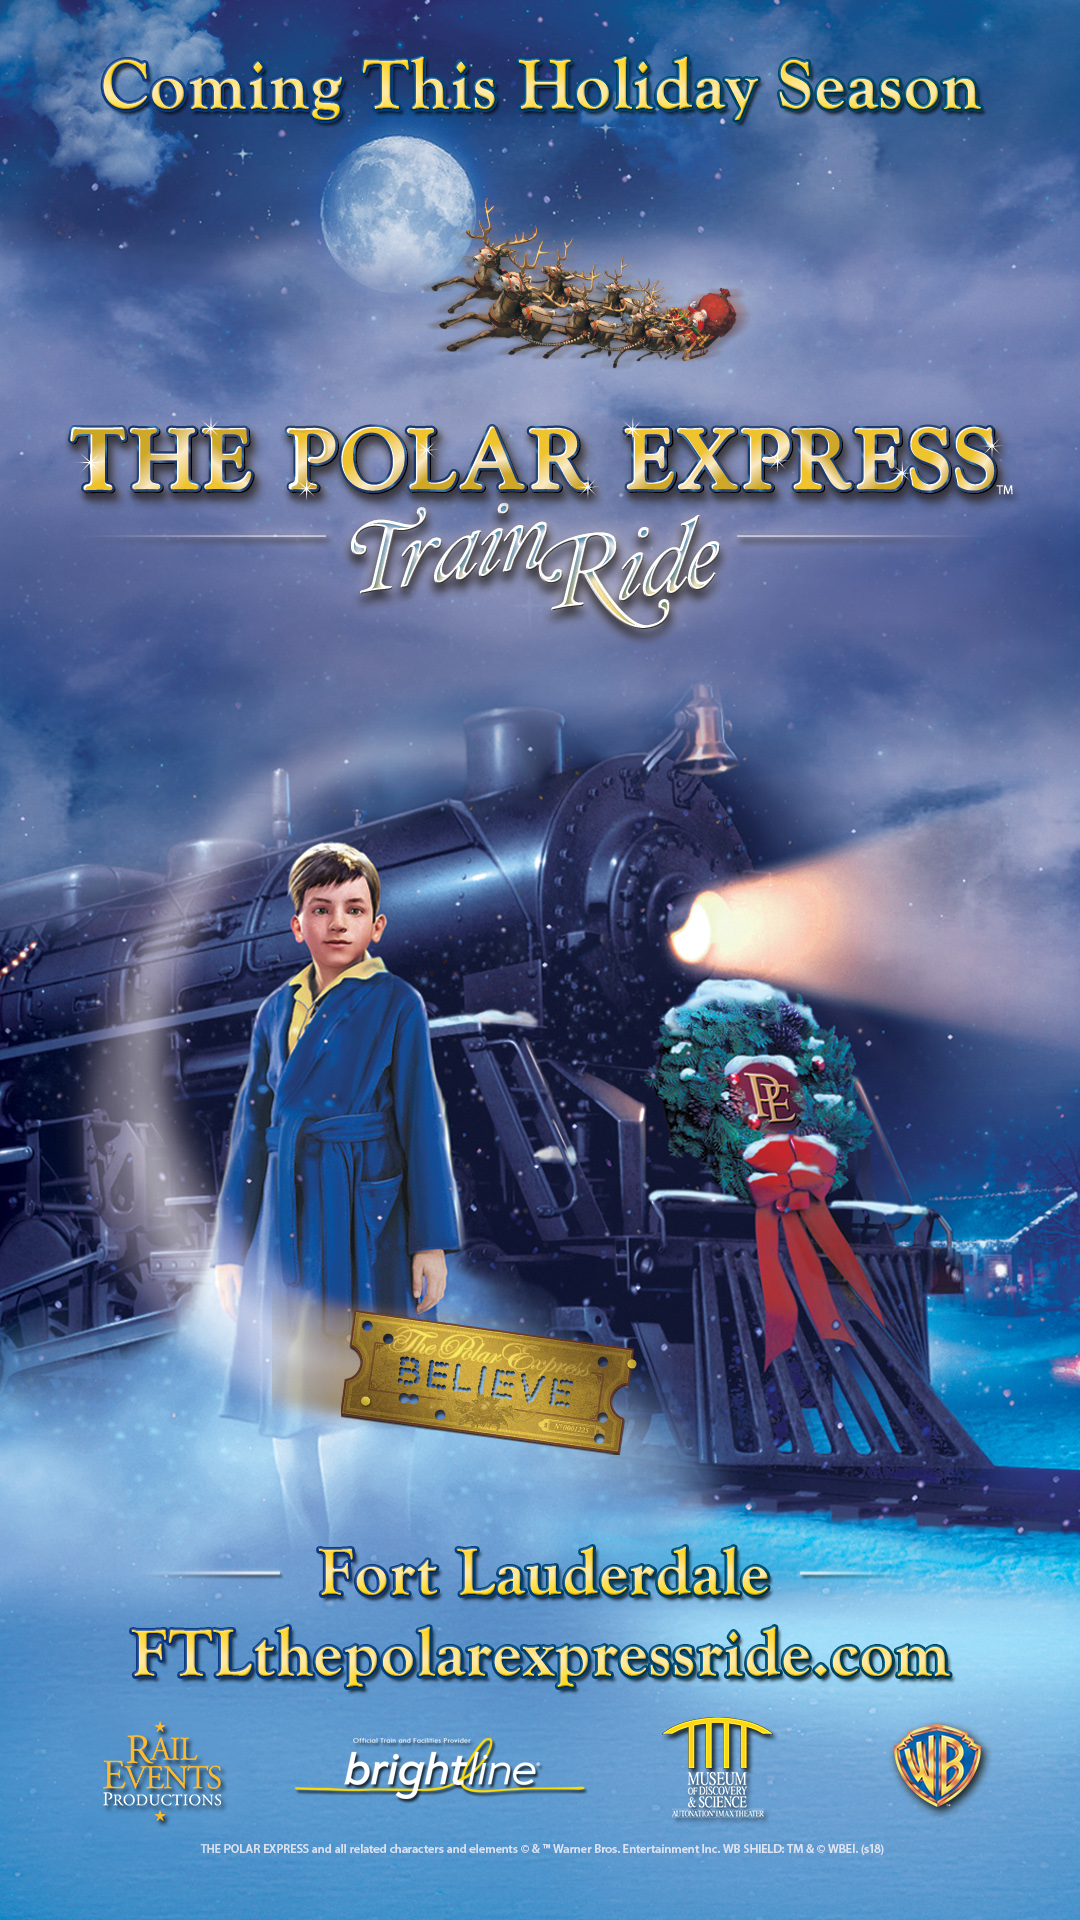 The Polar Express Train Ride Riverwalk Fort Lauderdale